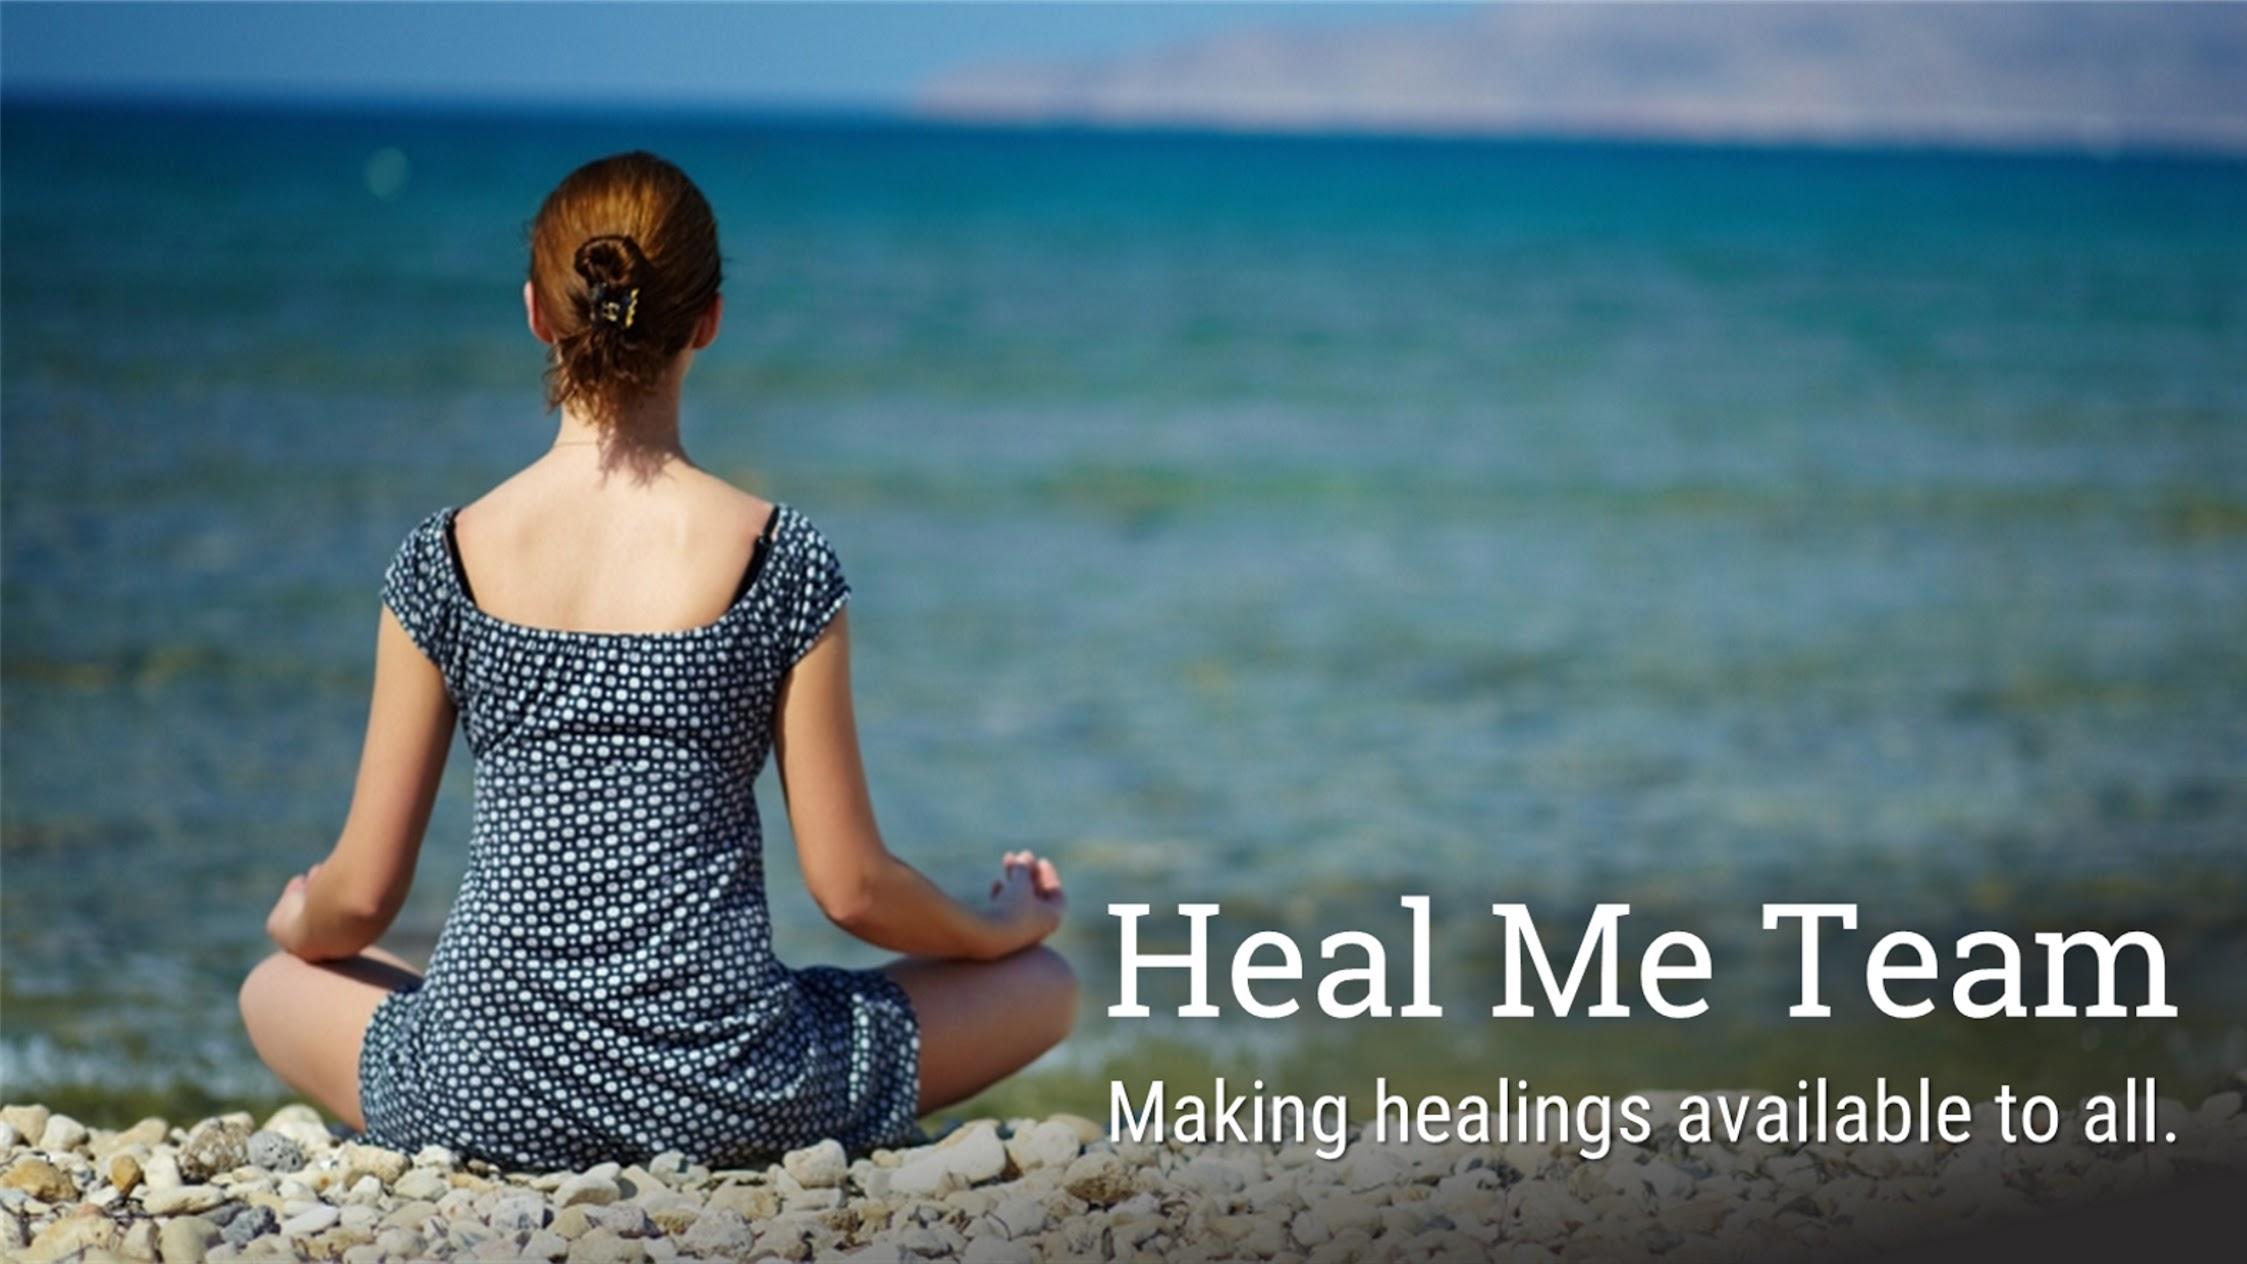 Heal Me Team